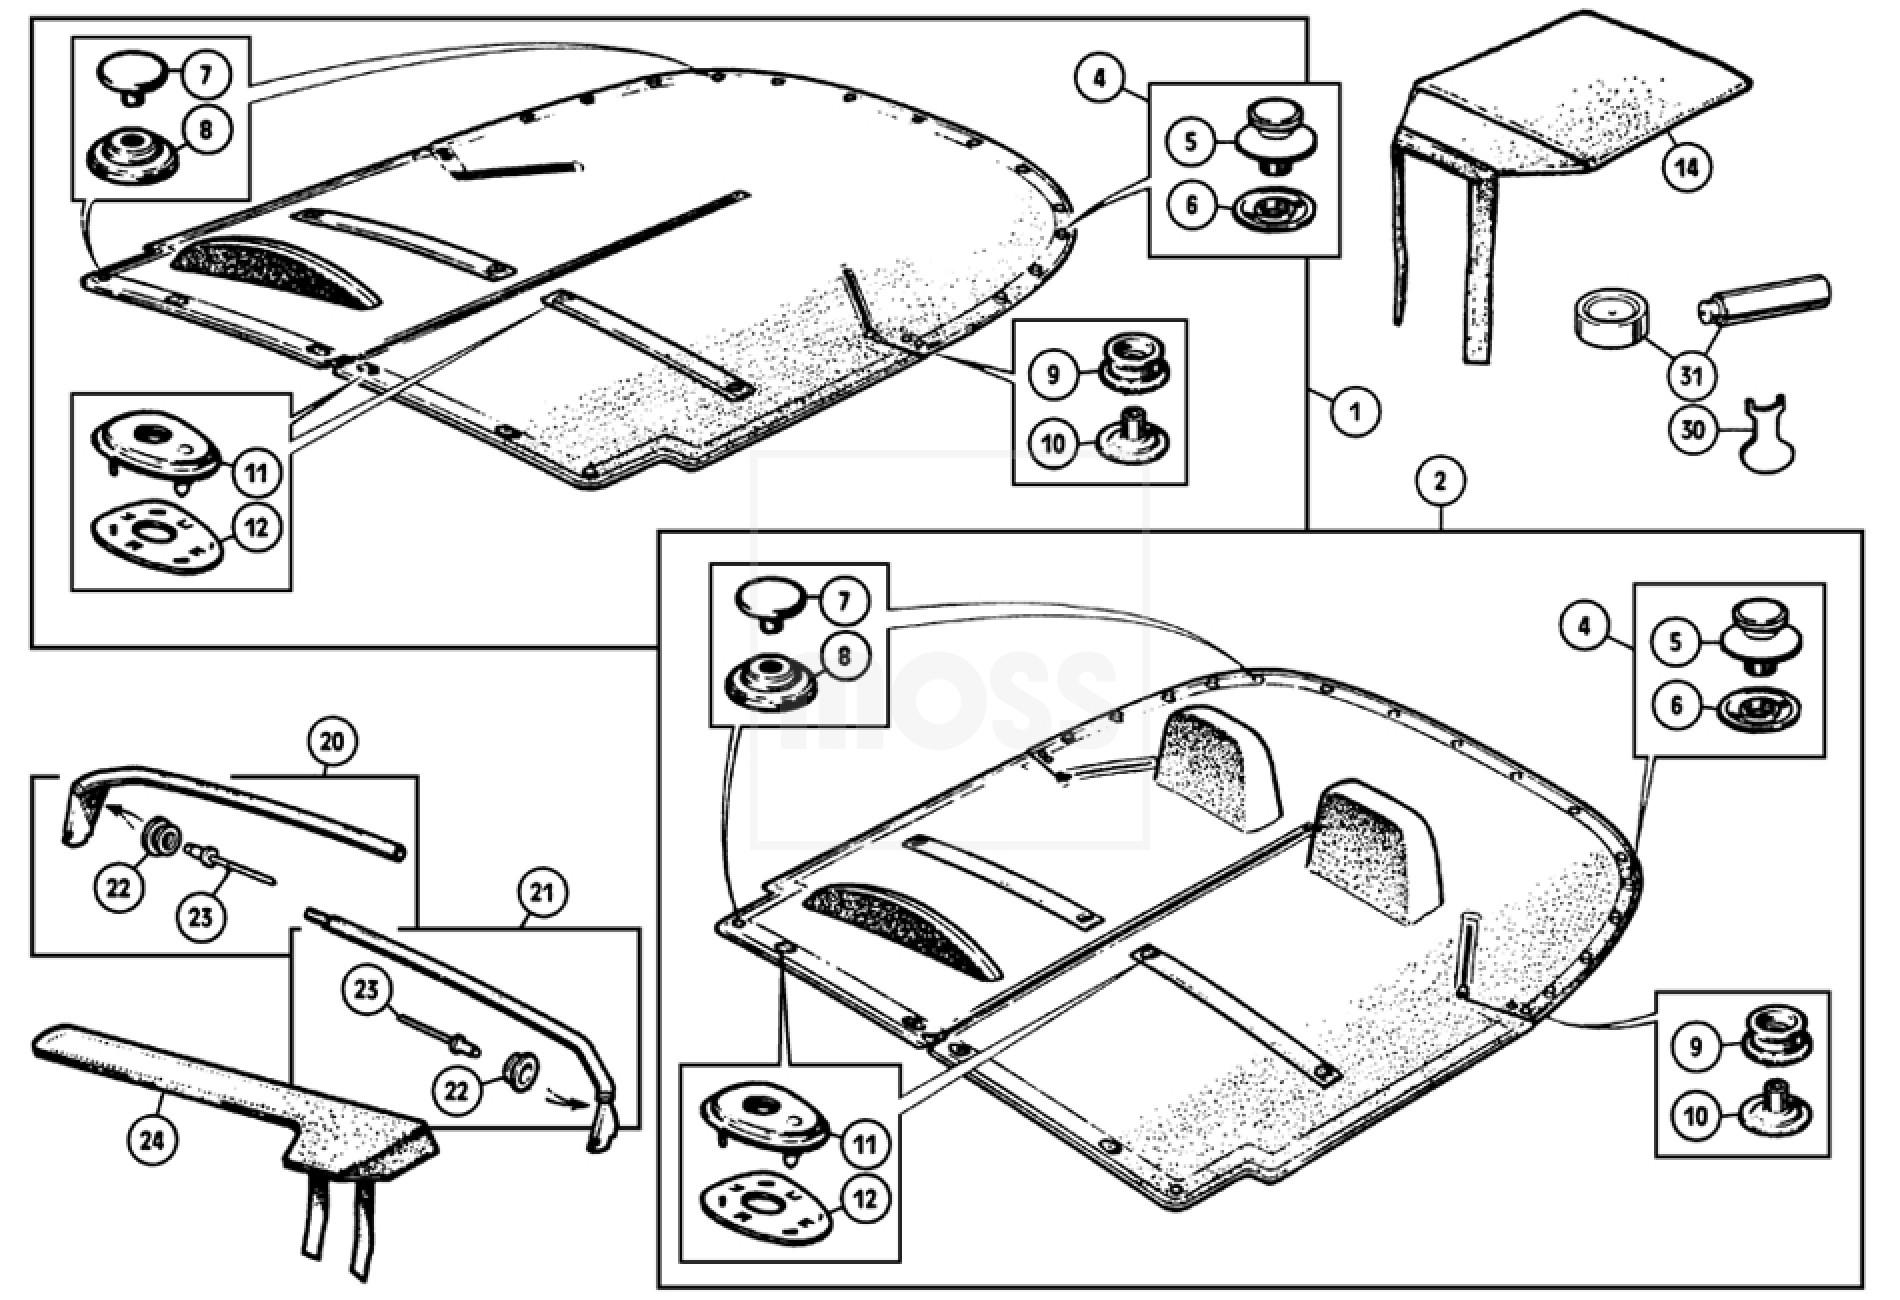 Playstation 3 Controller Wiring Diagram